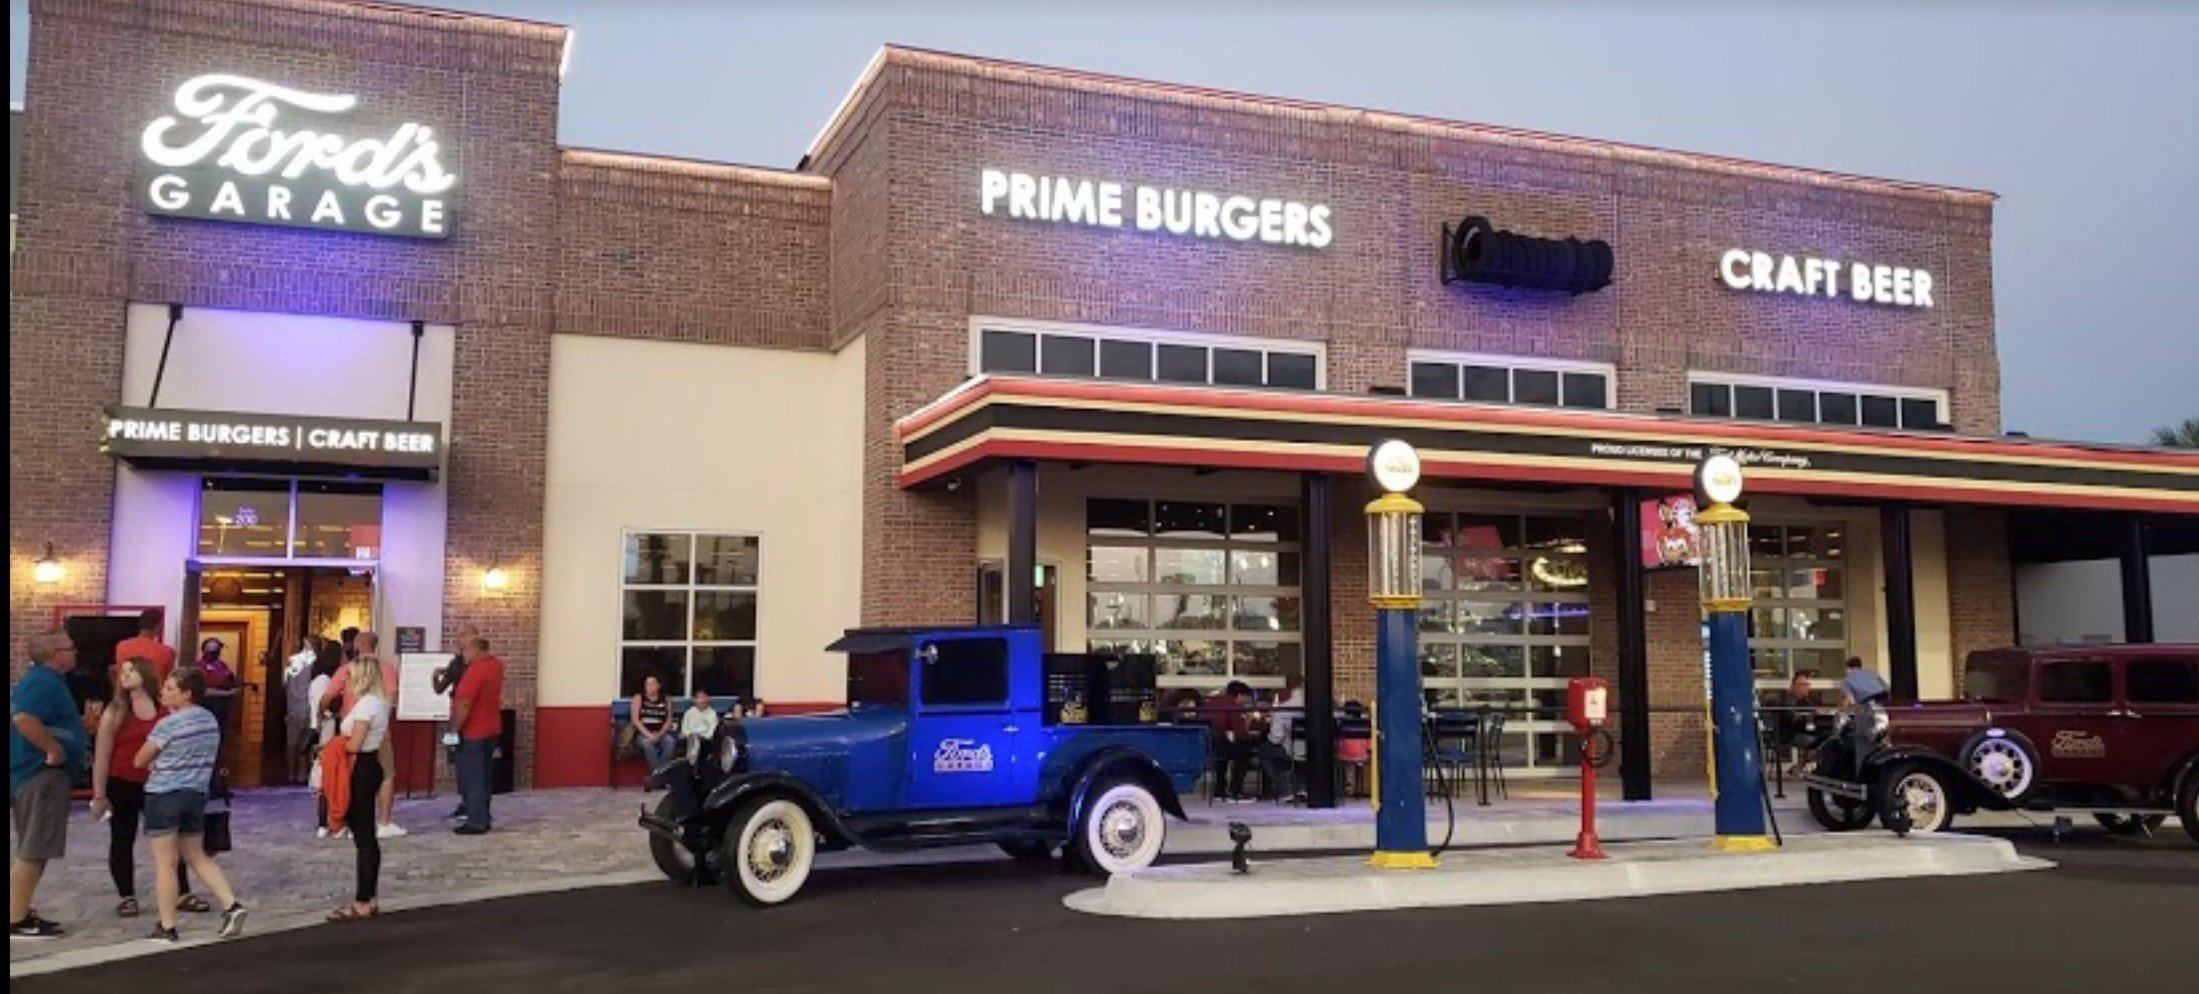 Ford's Garage Restaurant and Bar at Bozard Ford